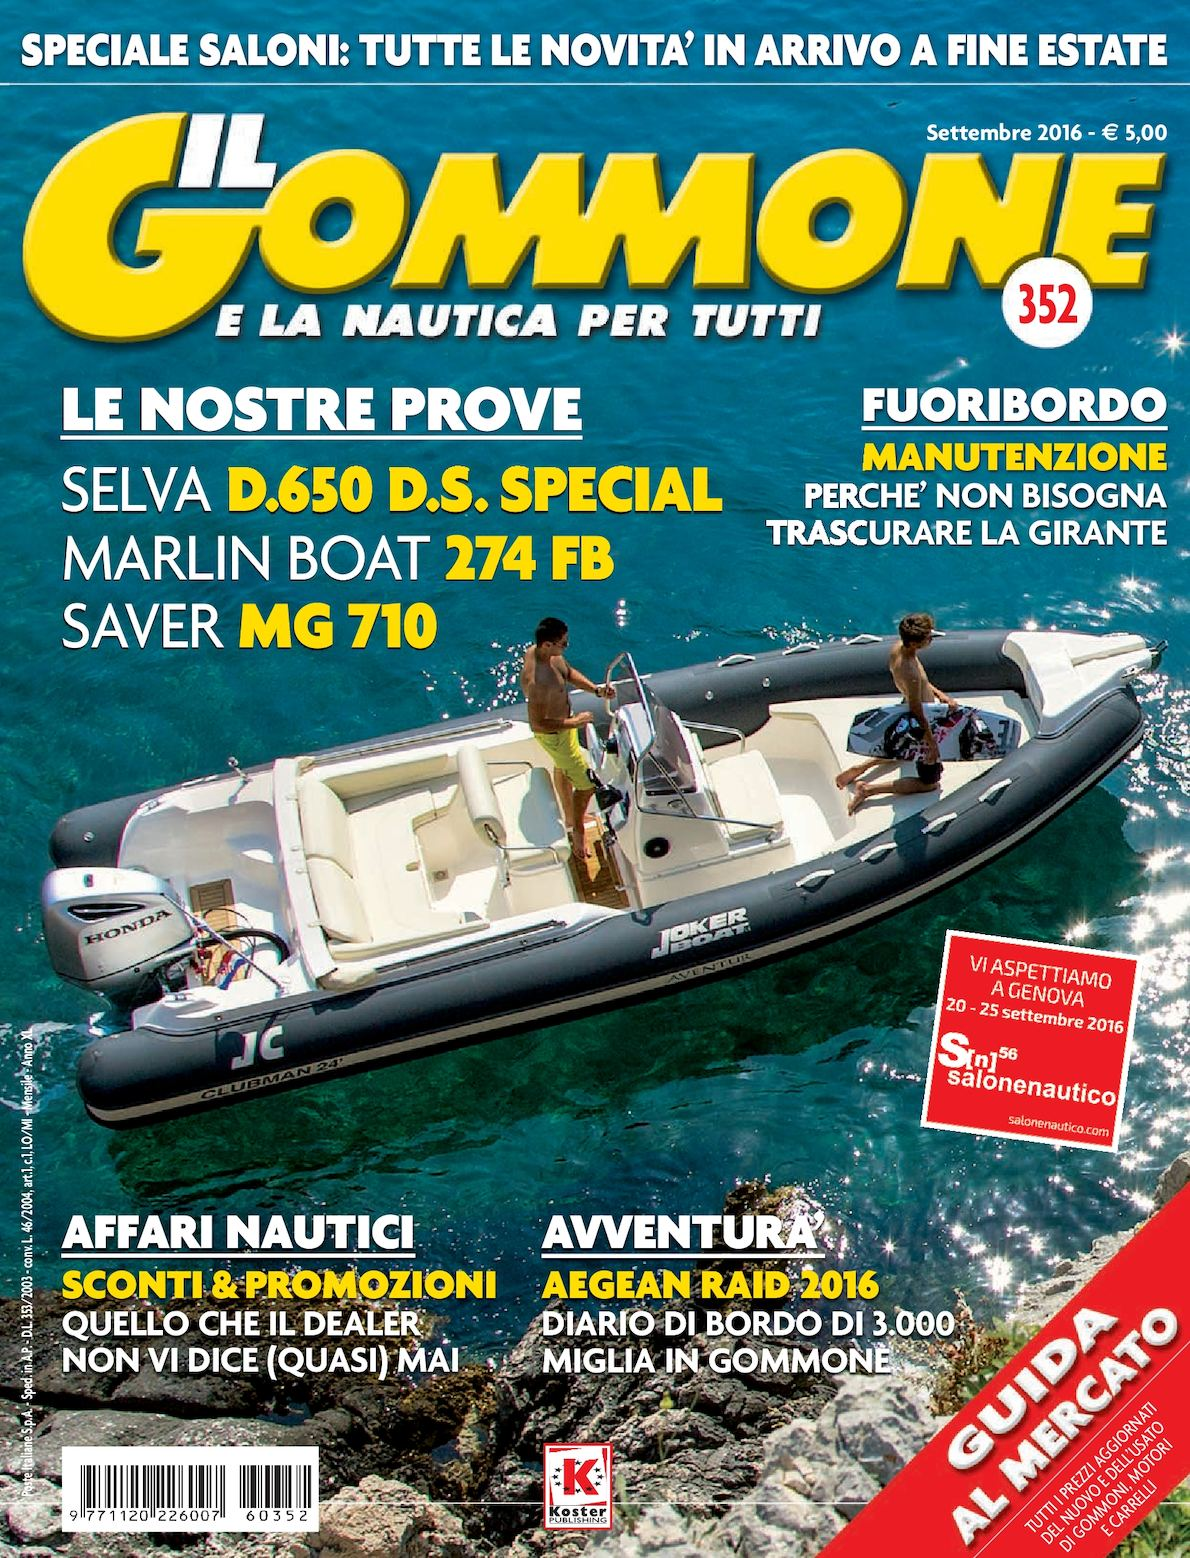 Il Gommone n. 352